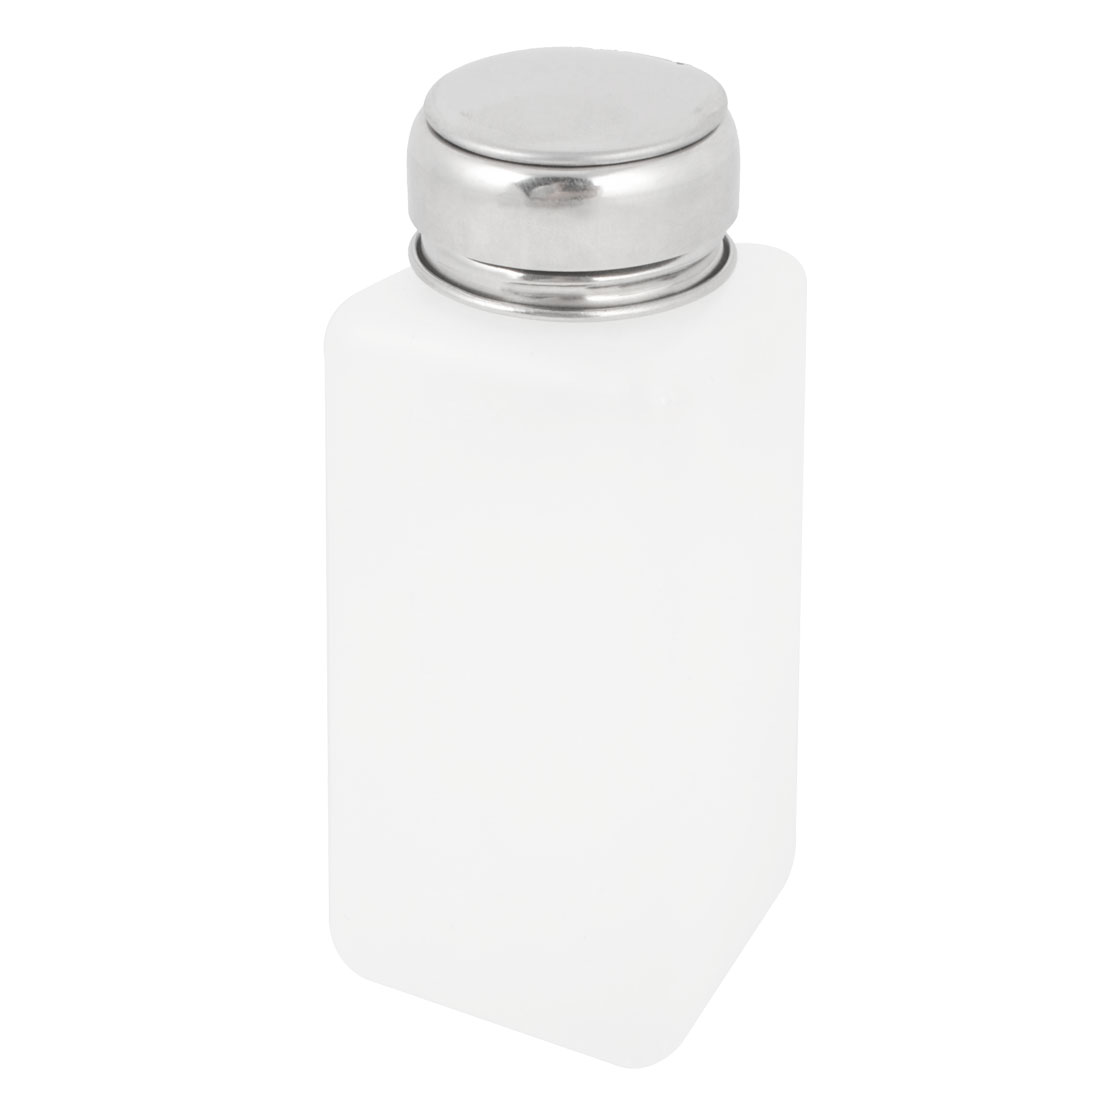 Silver Tone Metal Lid 250ml Plastic Liquid Storage Alcohol Bottle White